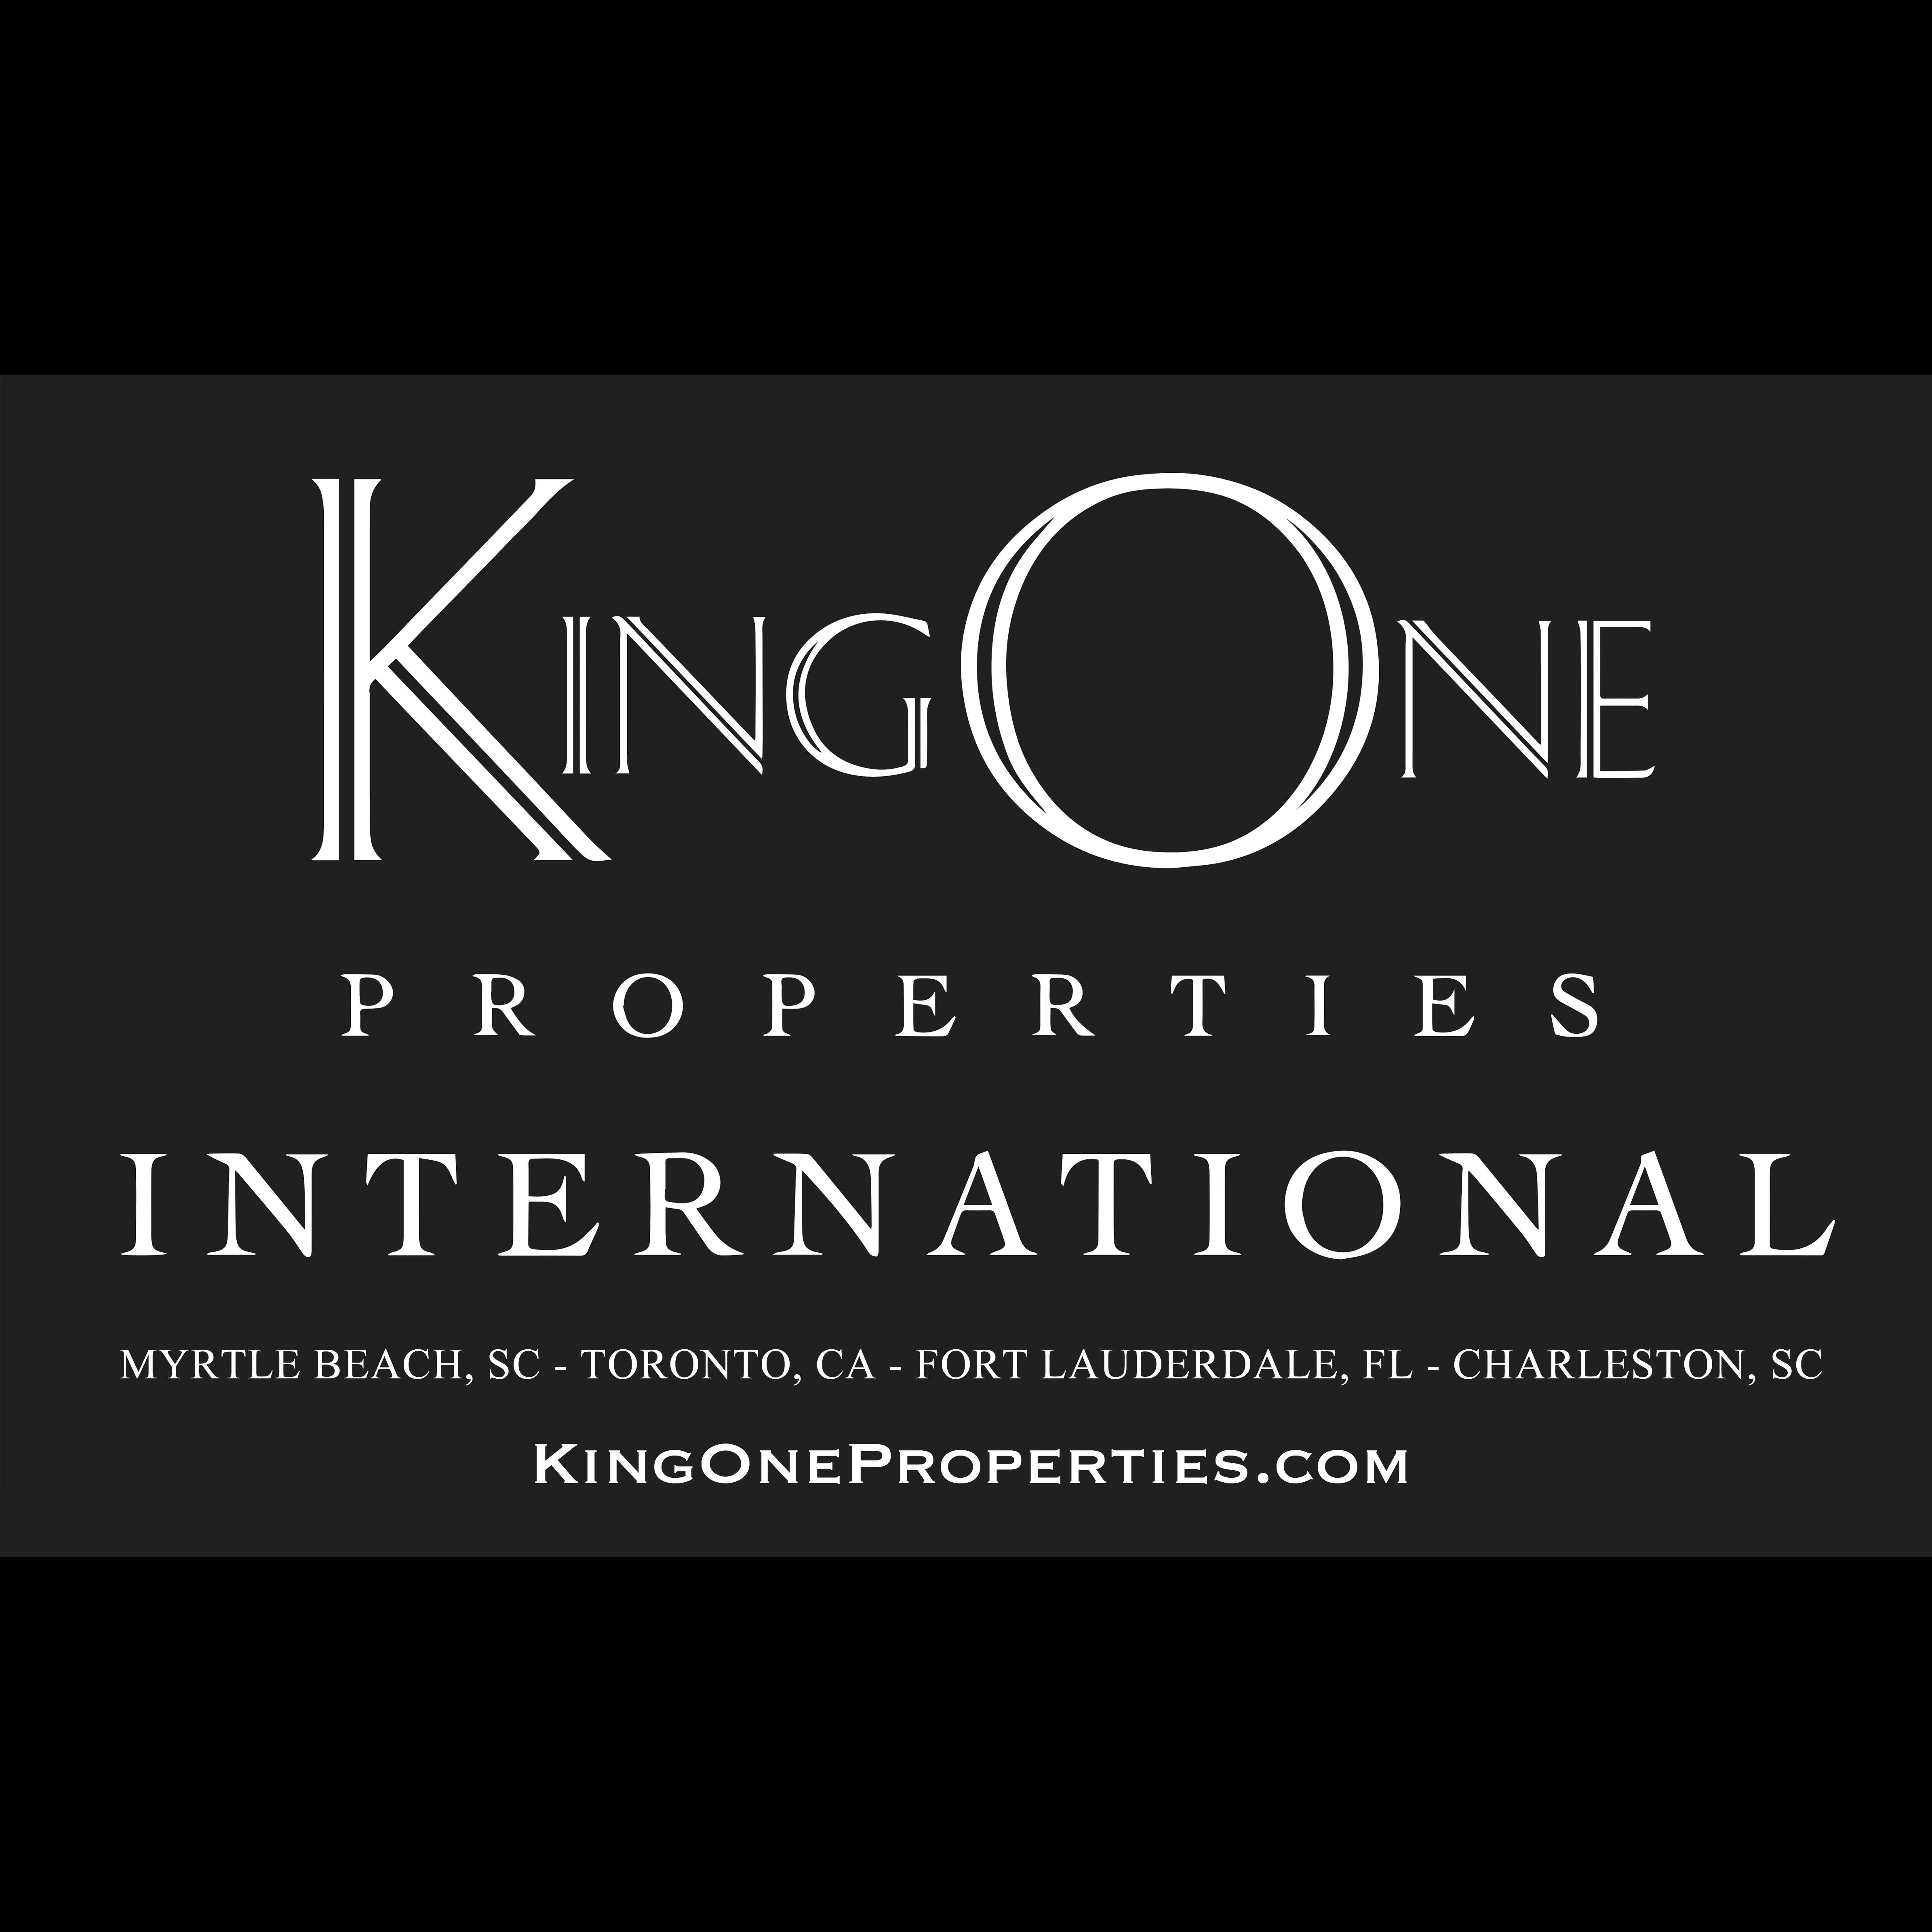 KingOne Properties International